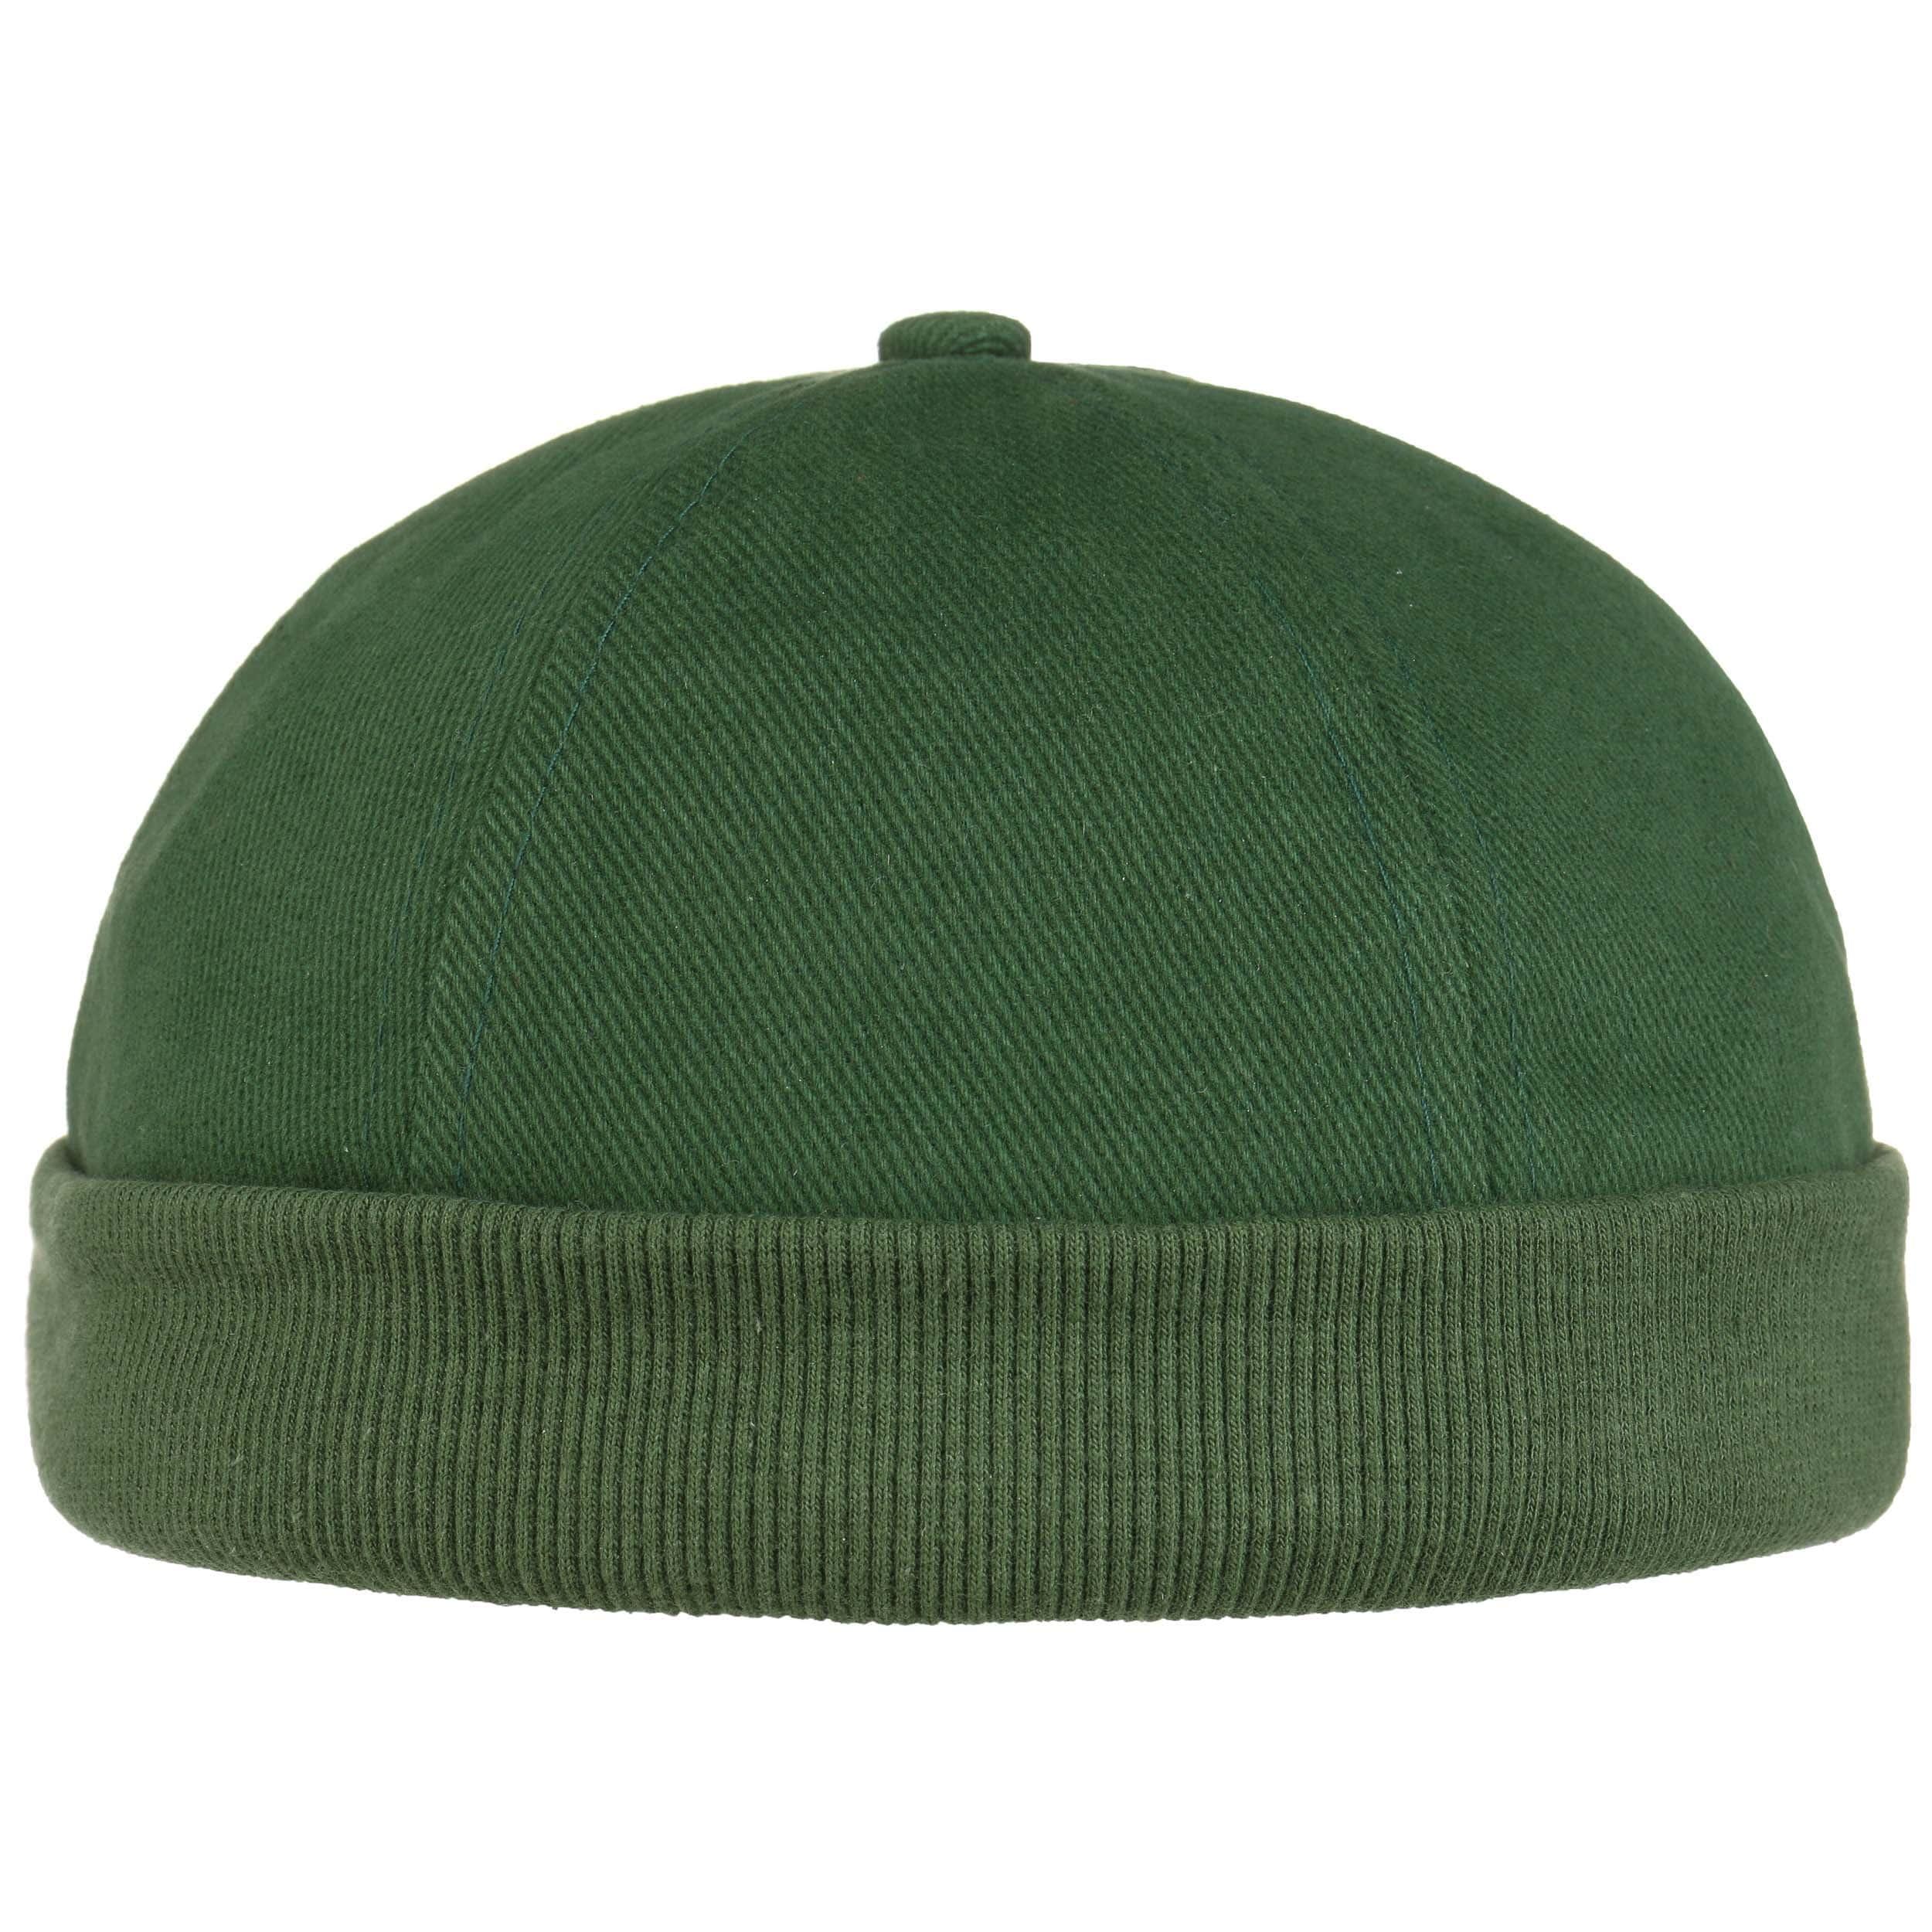 ... Cotton Docker Cap - dark green 6 ... 2f128385f56